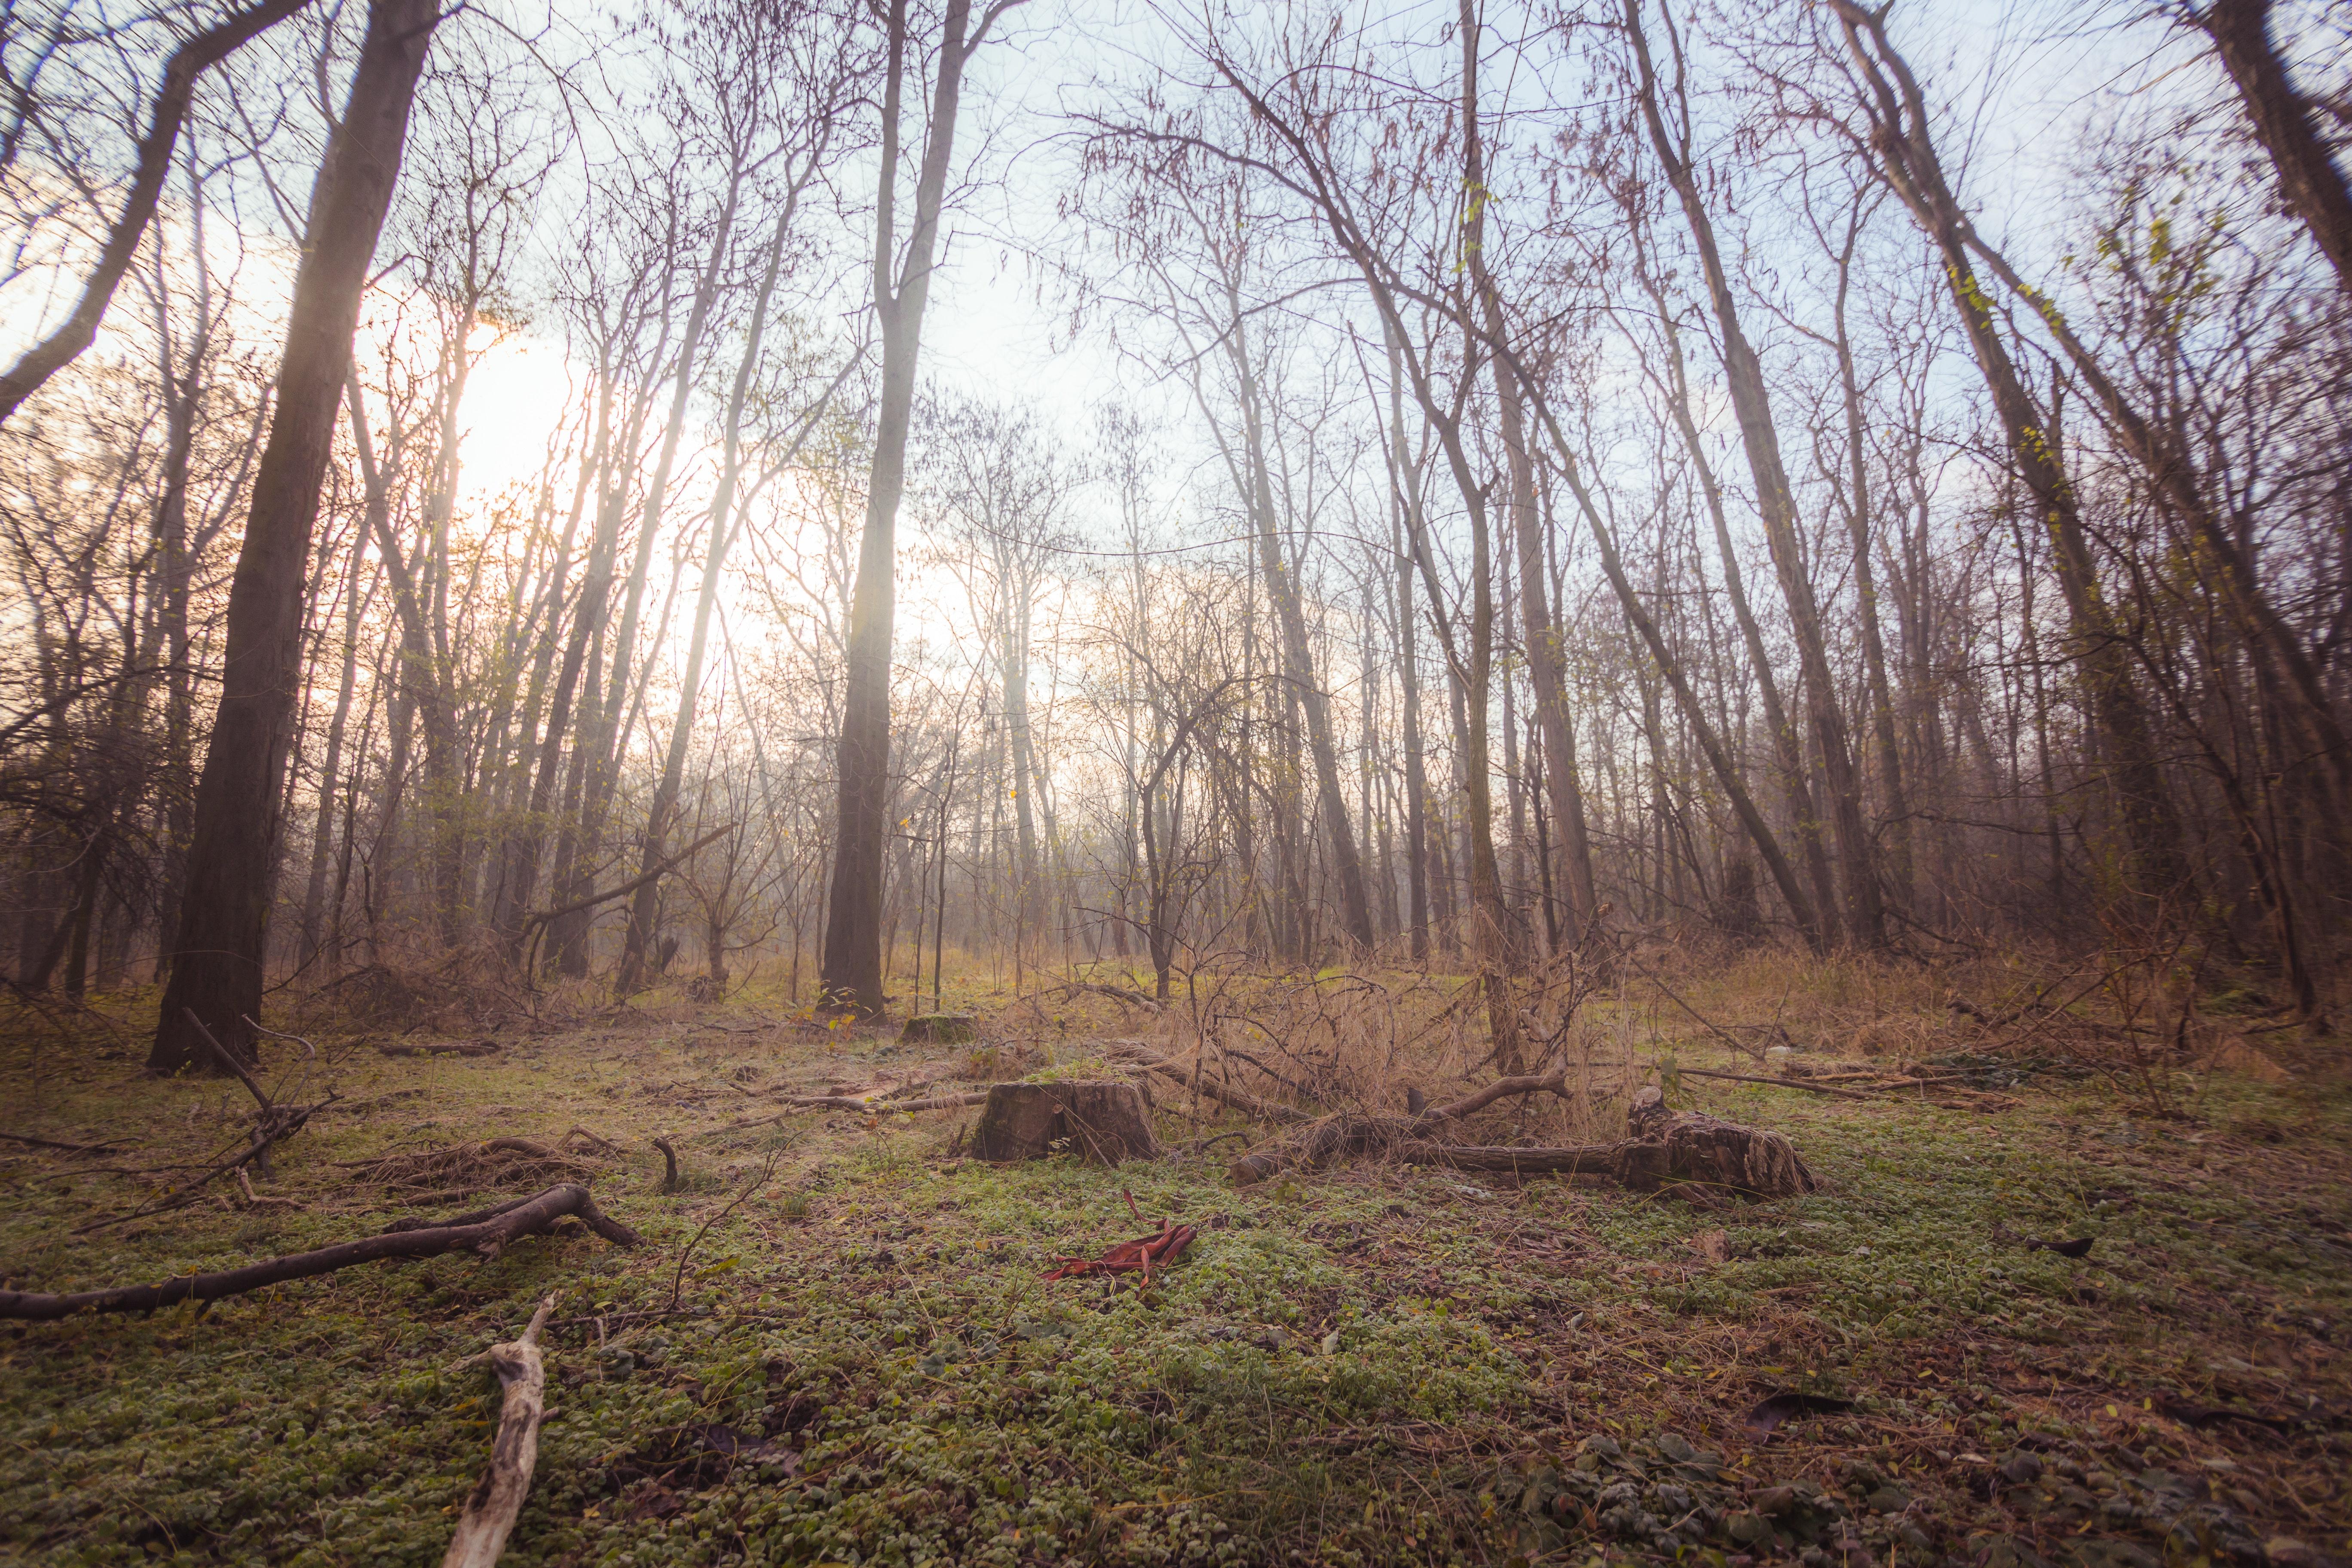 Free Images 4k Wallpaper Bare Trees Dawn Dusk Environment